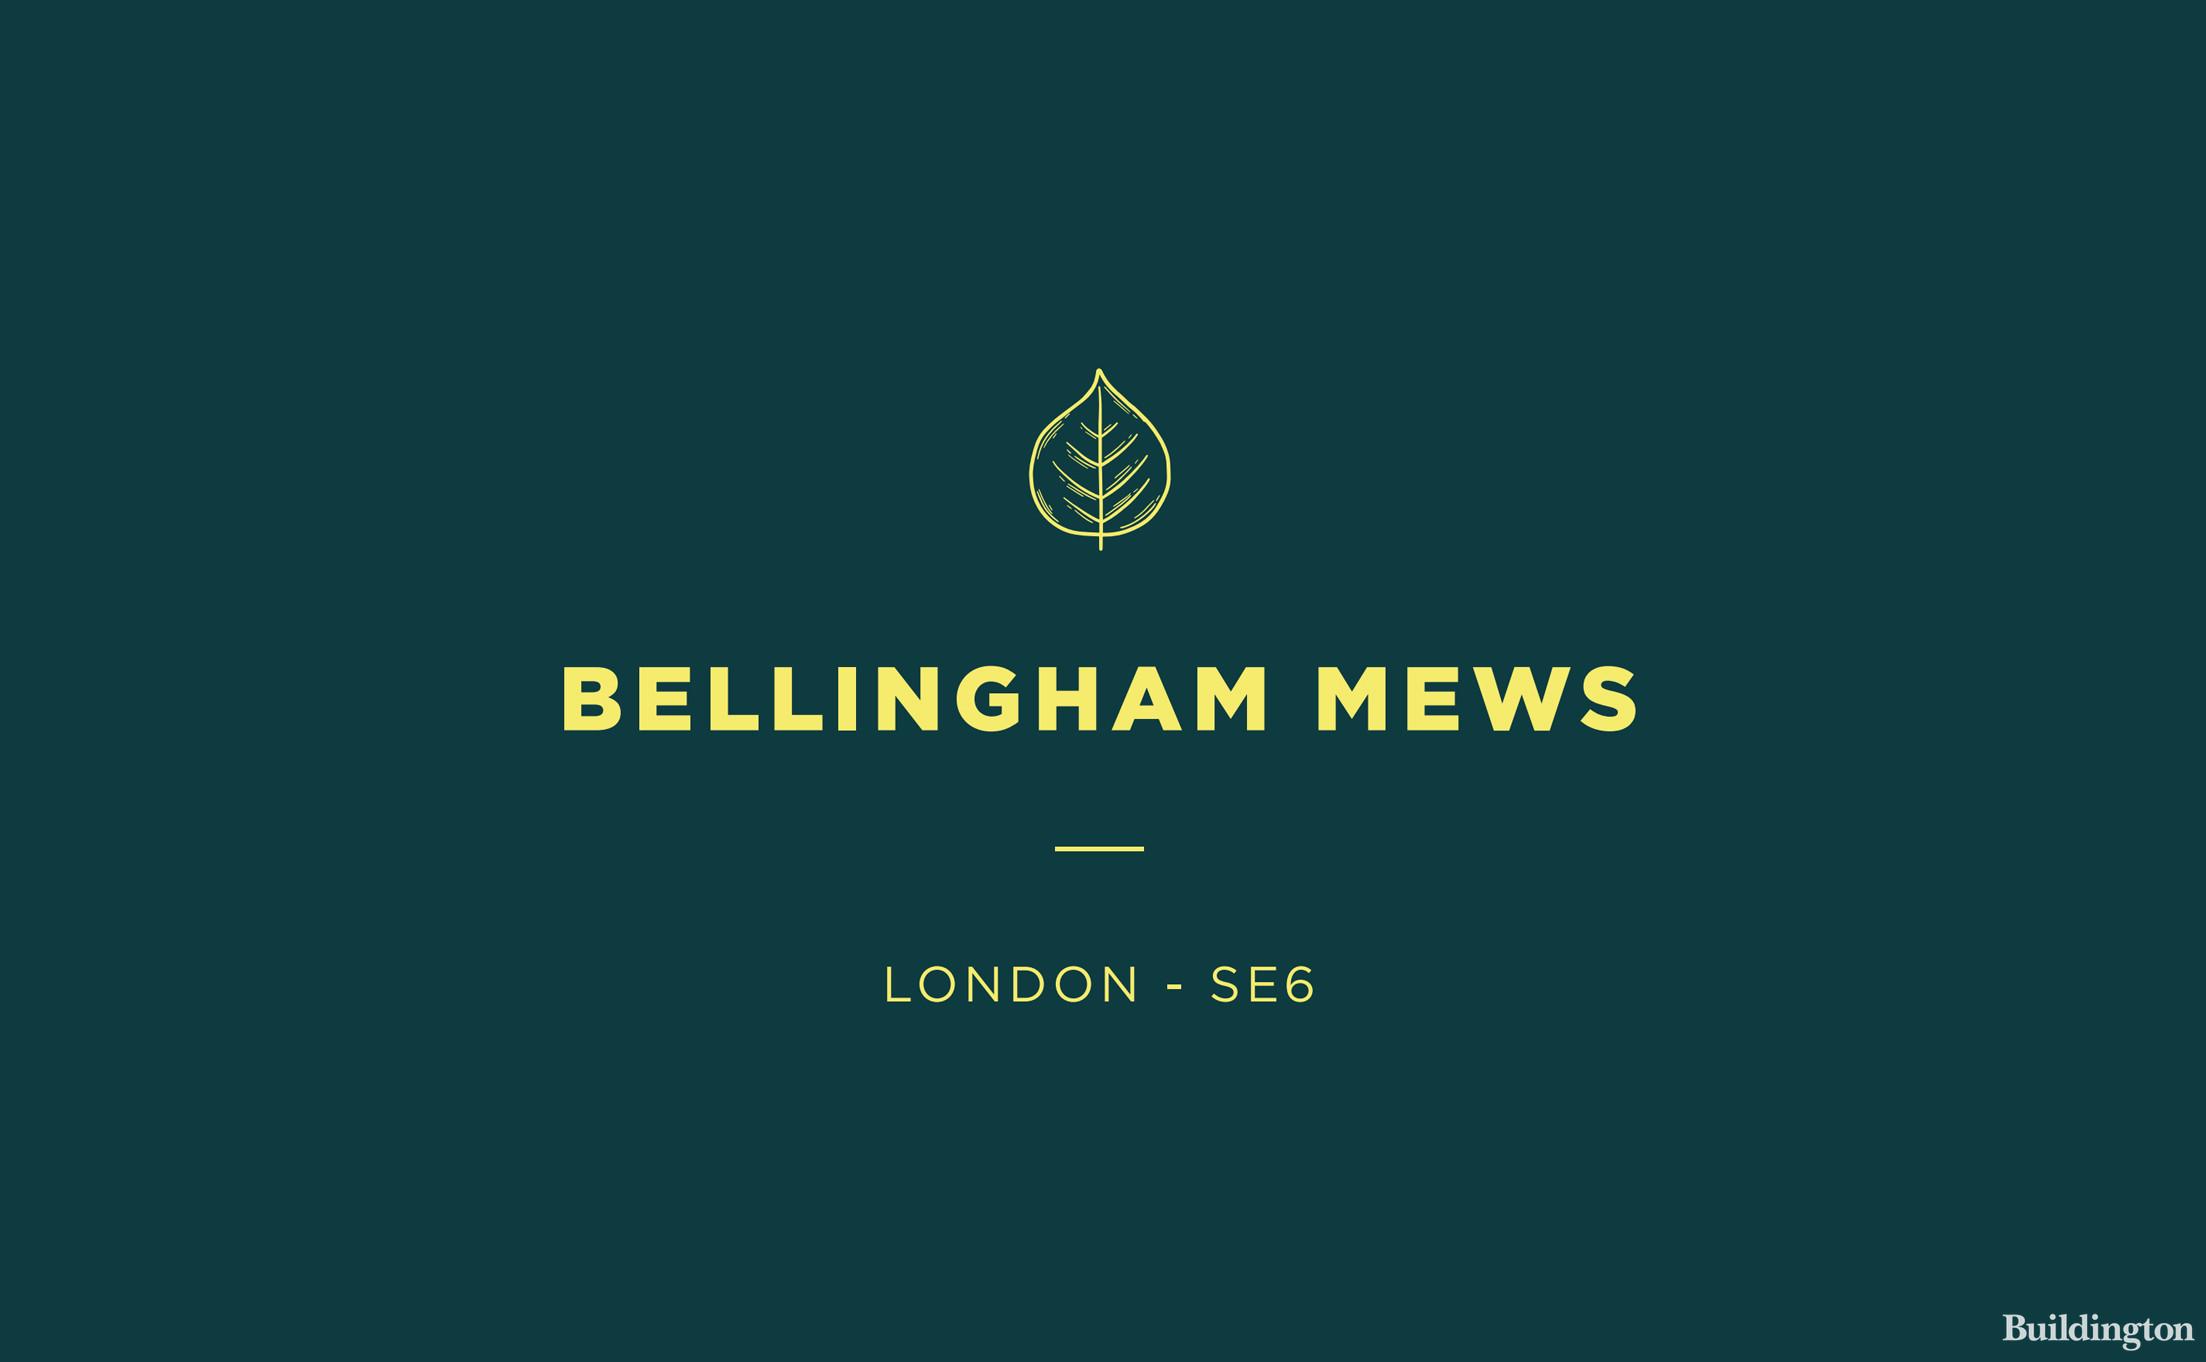 Bellingham Mews development logo.